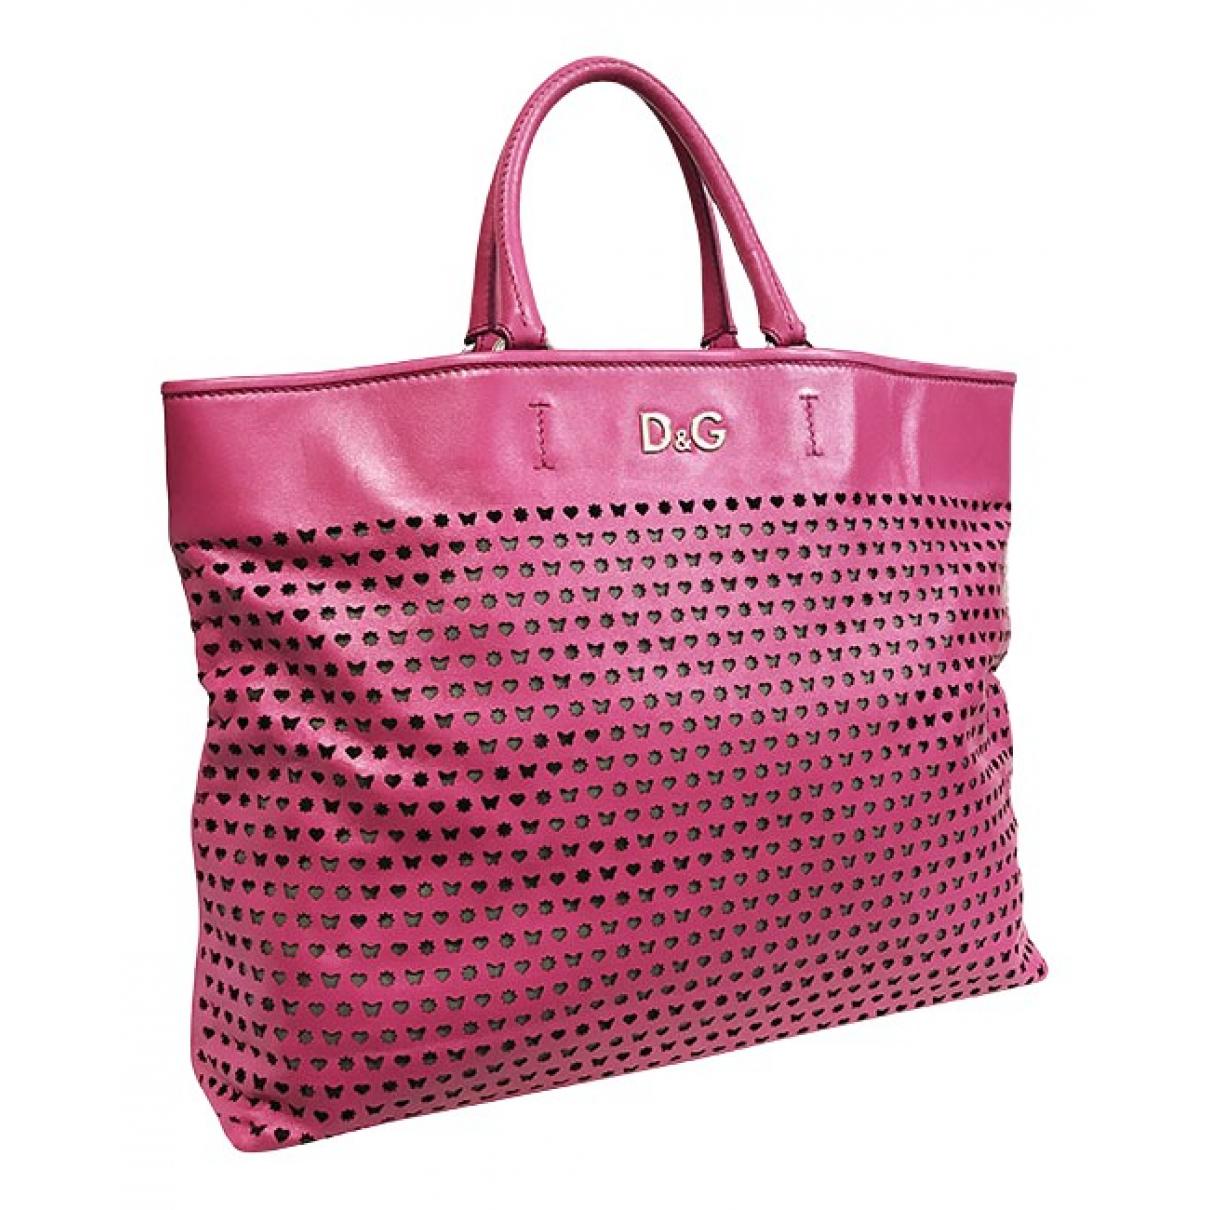 Dolce & Gabbana \N Pink Leather handbag for Women \N